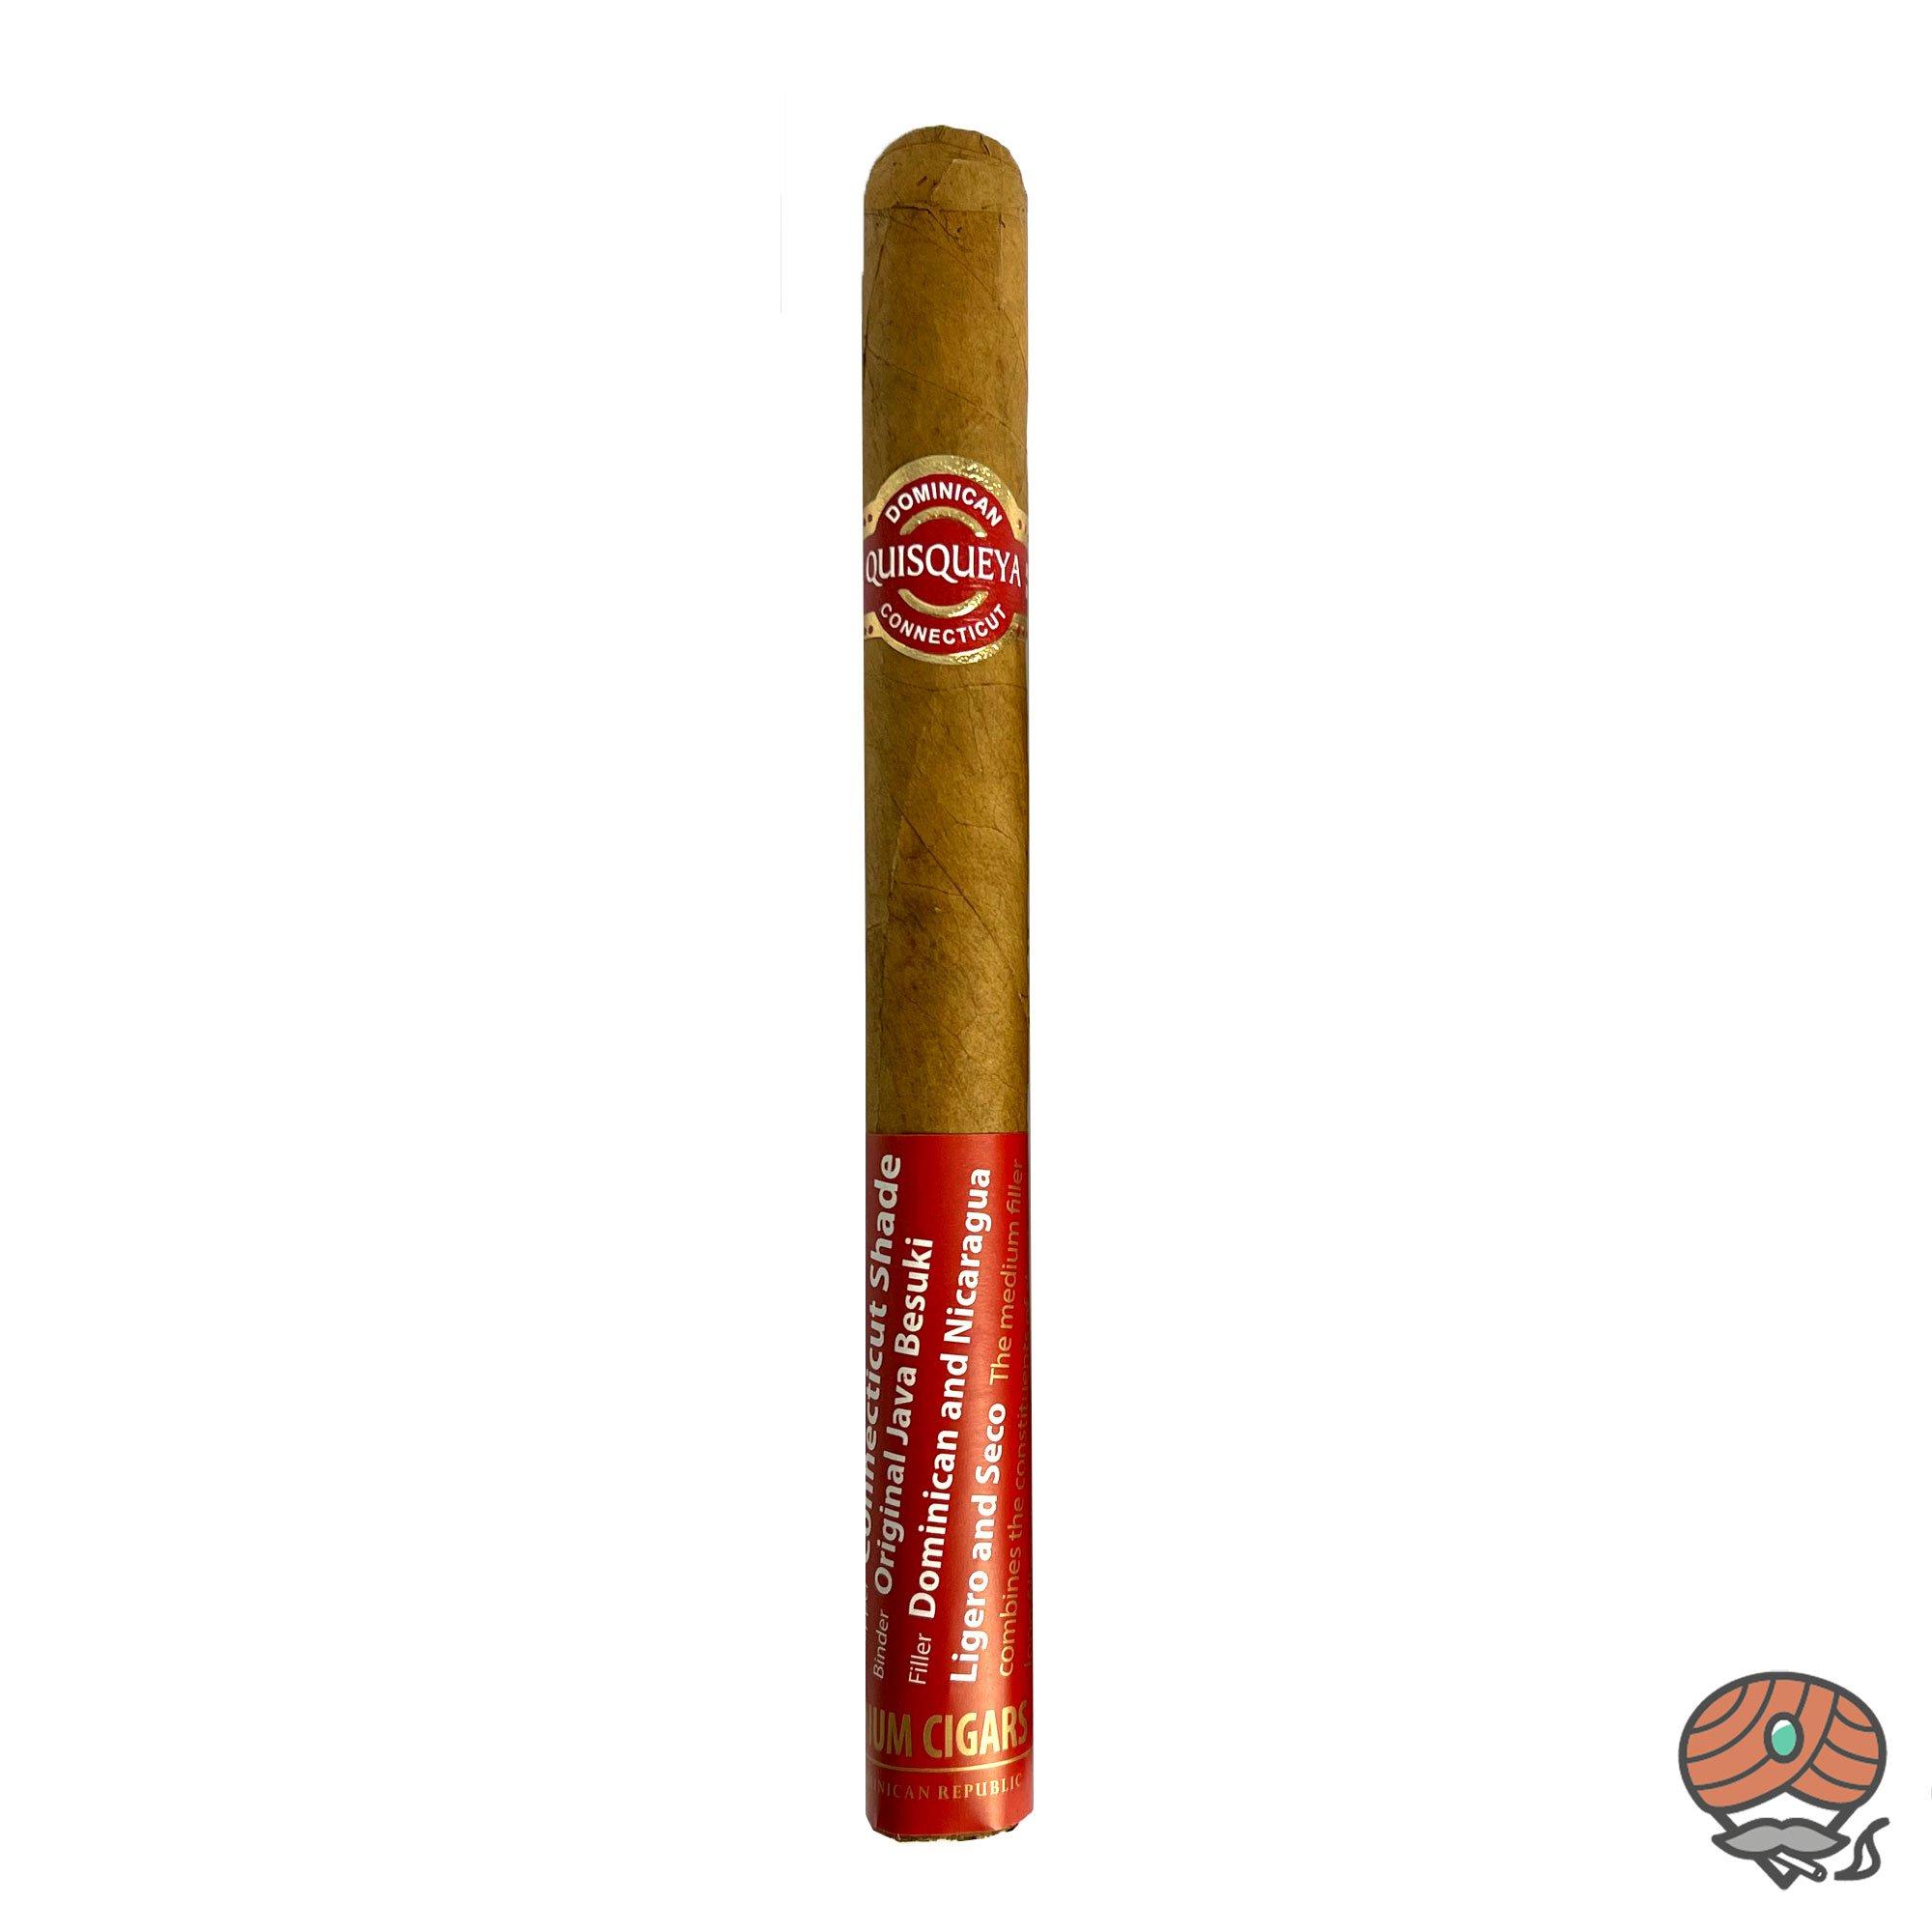 Quisqueya Connecticut Churchills Zigarre Dominikanische Republik